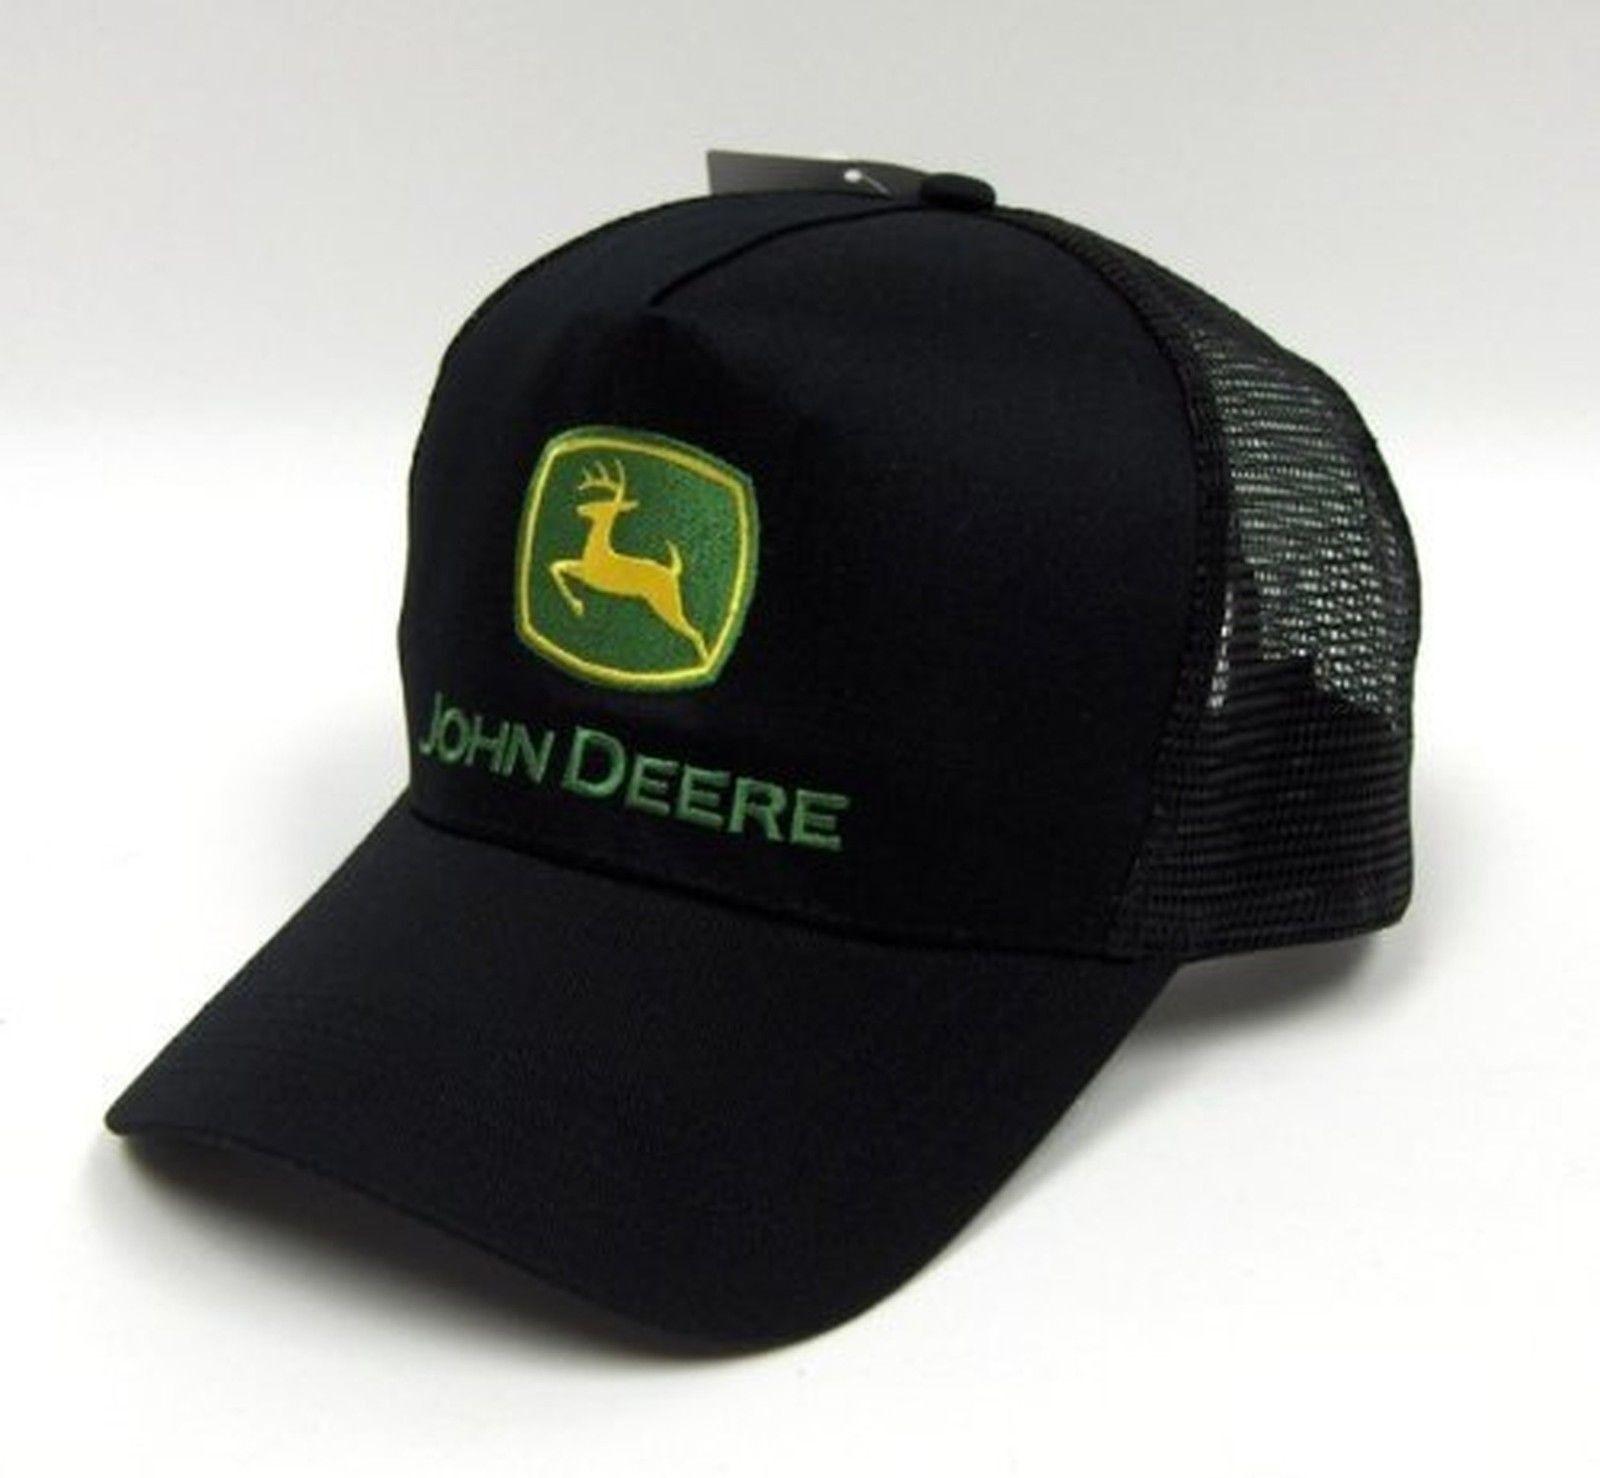 379cc445fdd273 Original John Deere Logo Adjustable Black Mesh Hat | Products ...